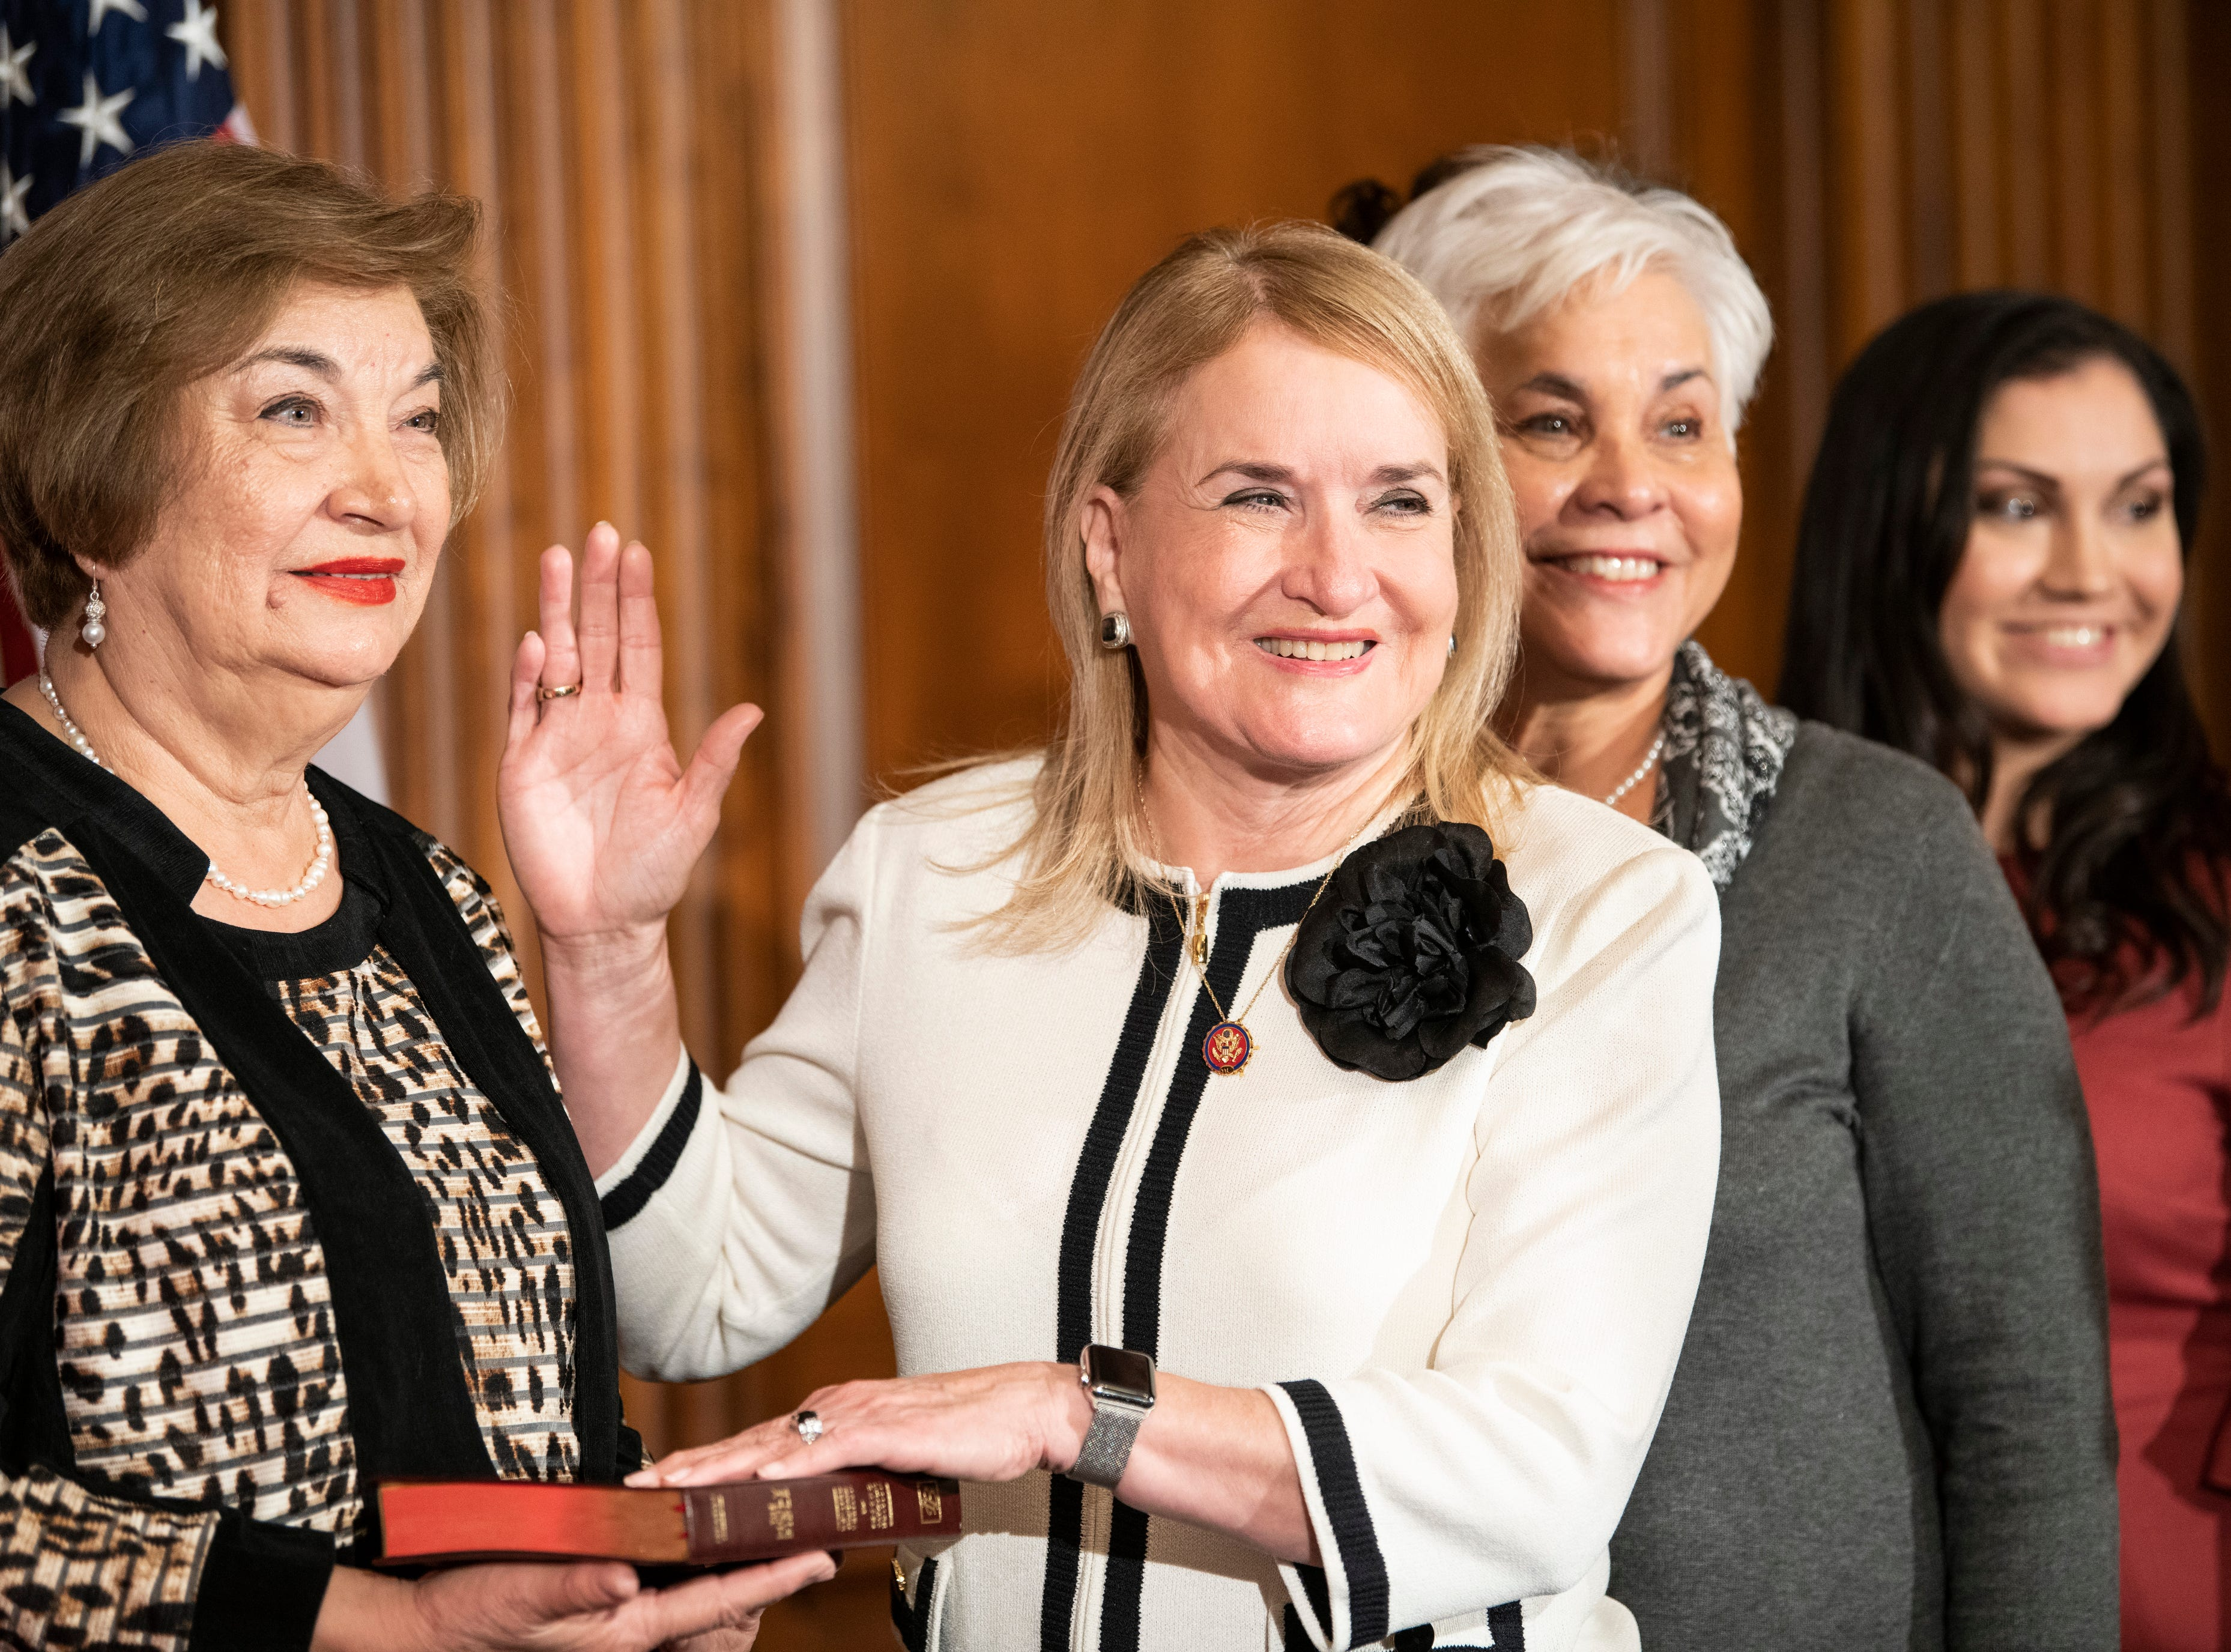 Rep. Sylvia Garcia (D, TX) is sworn in.